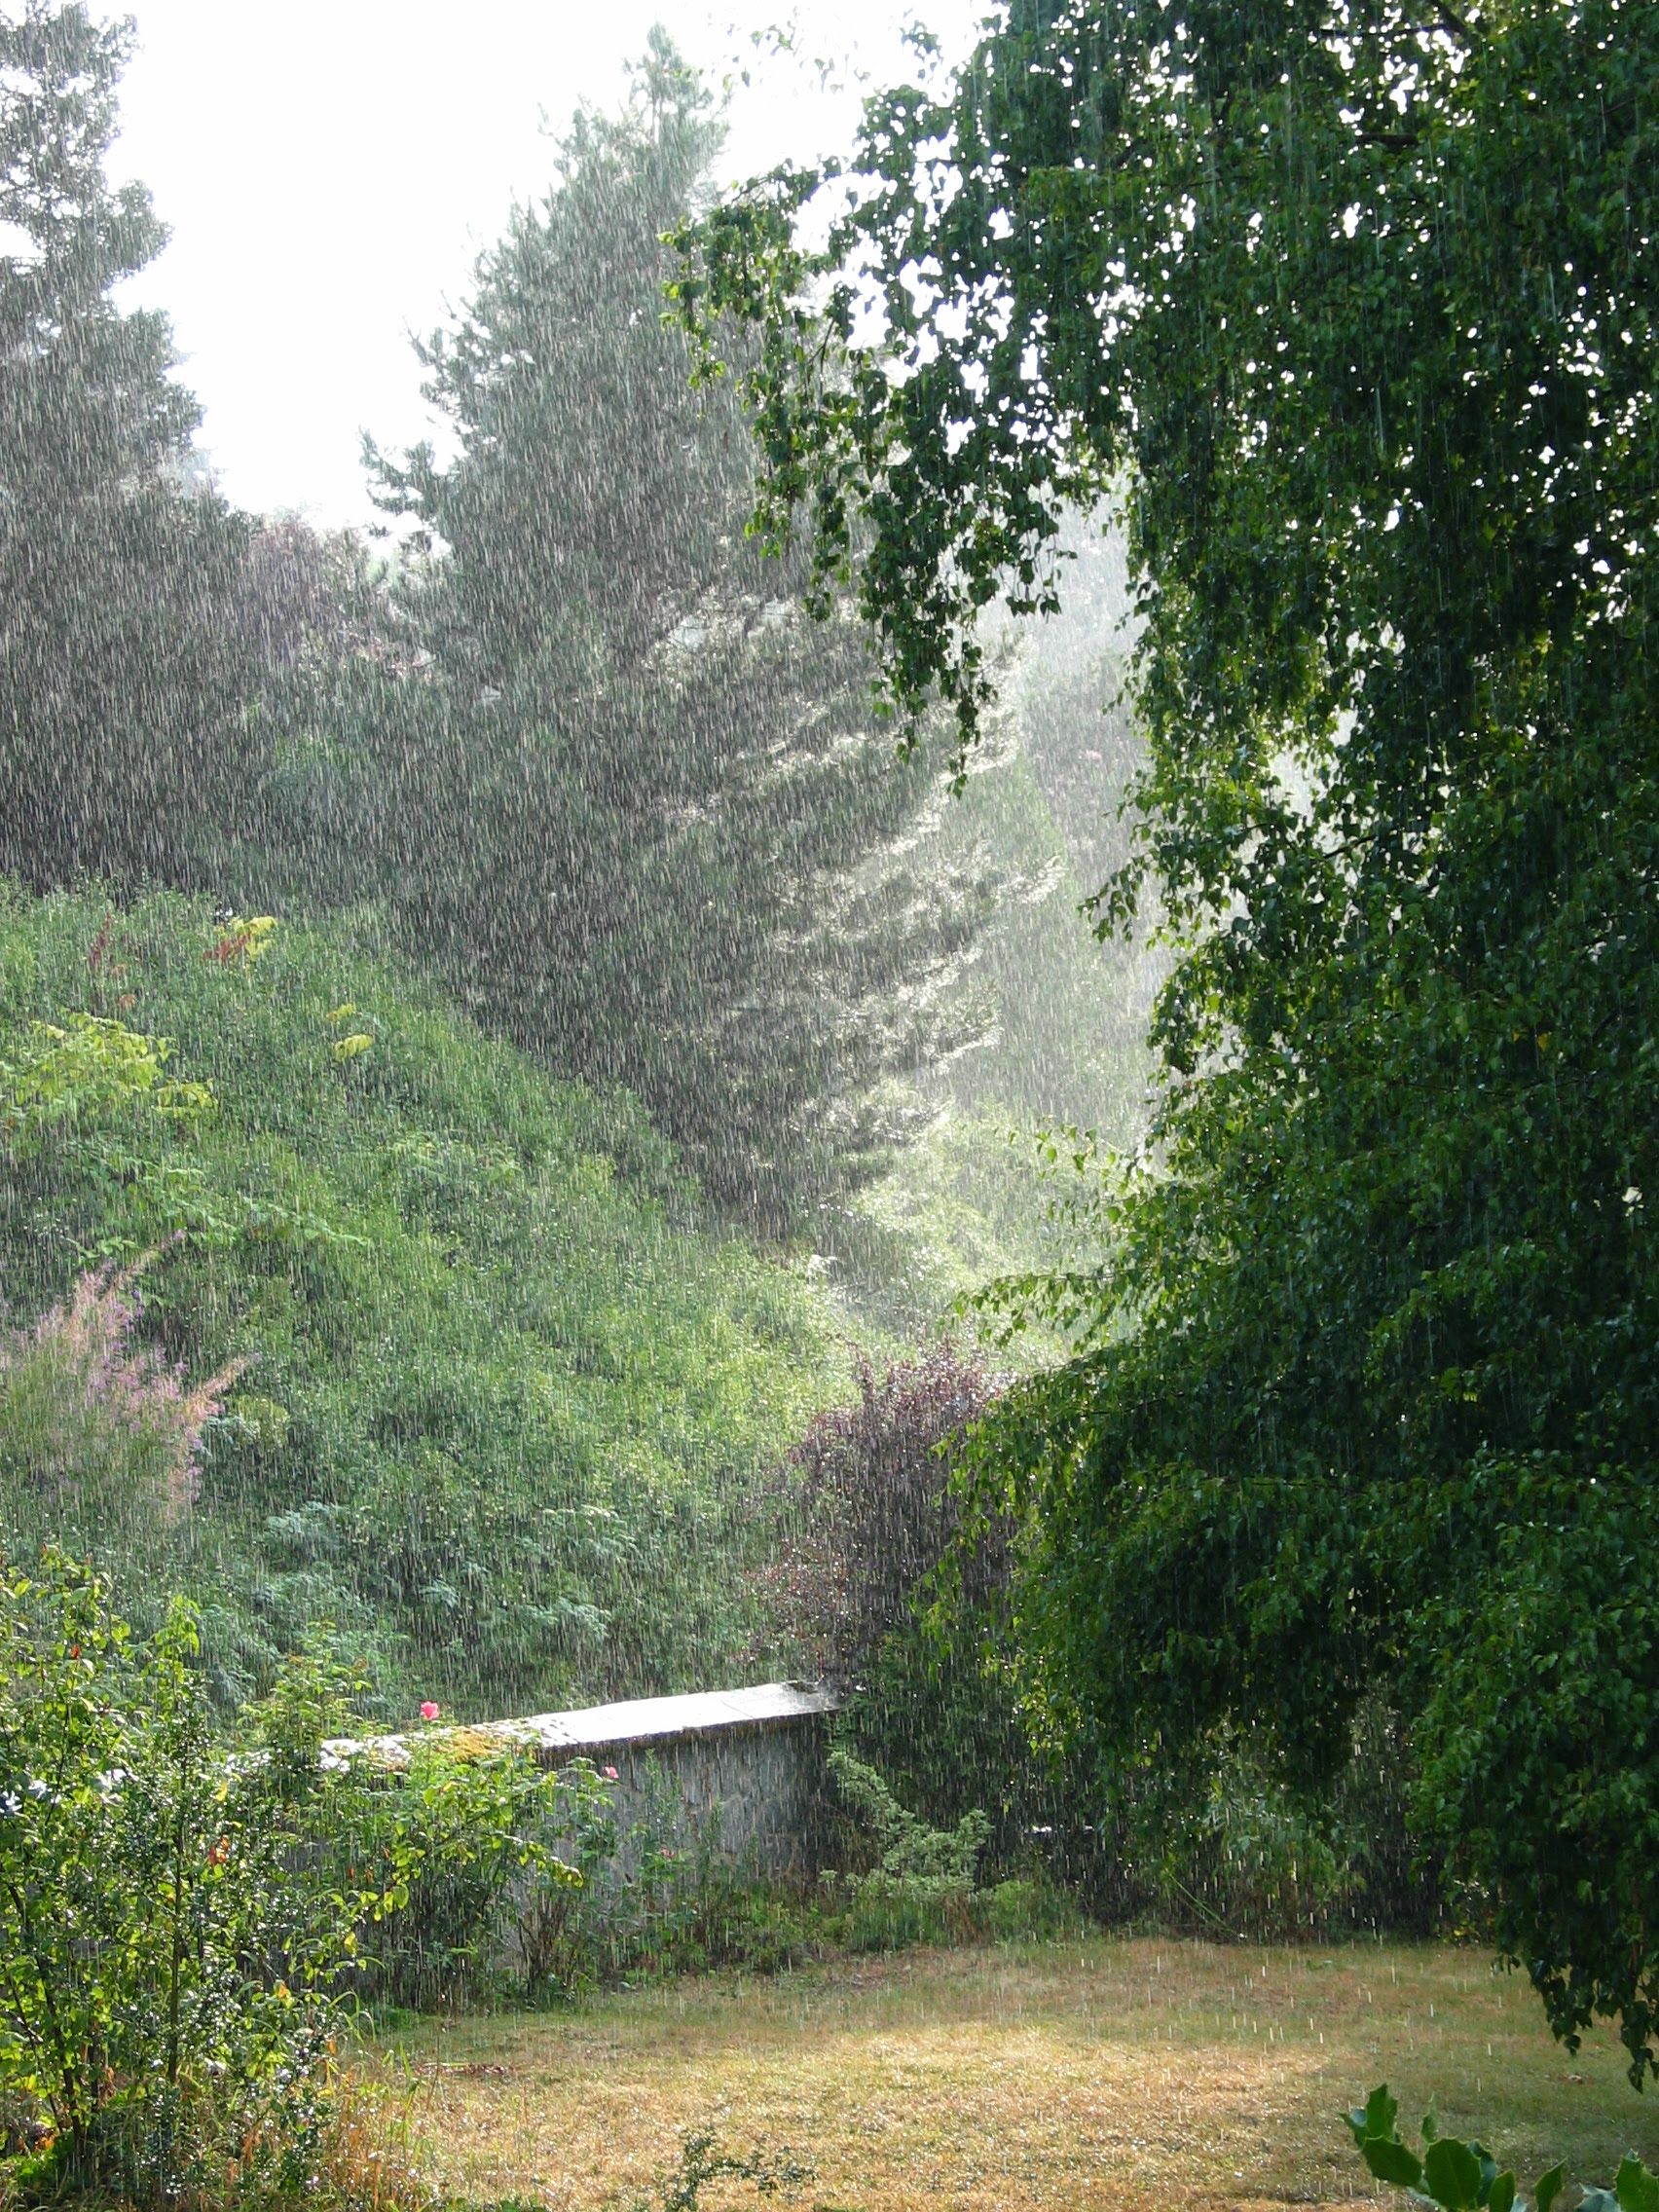 http://upload.wikimedia.org/wikipedia/commons/9/9b/Rain_falling.JPG